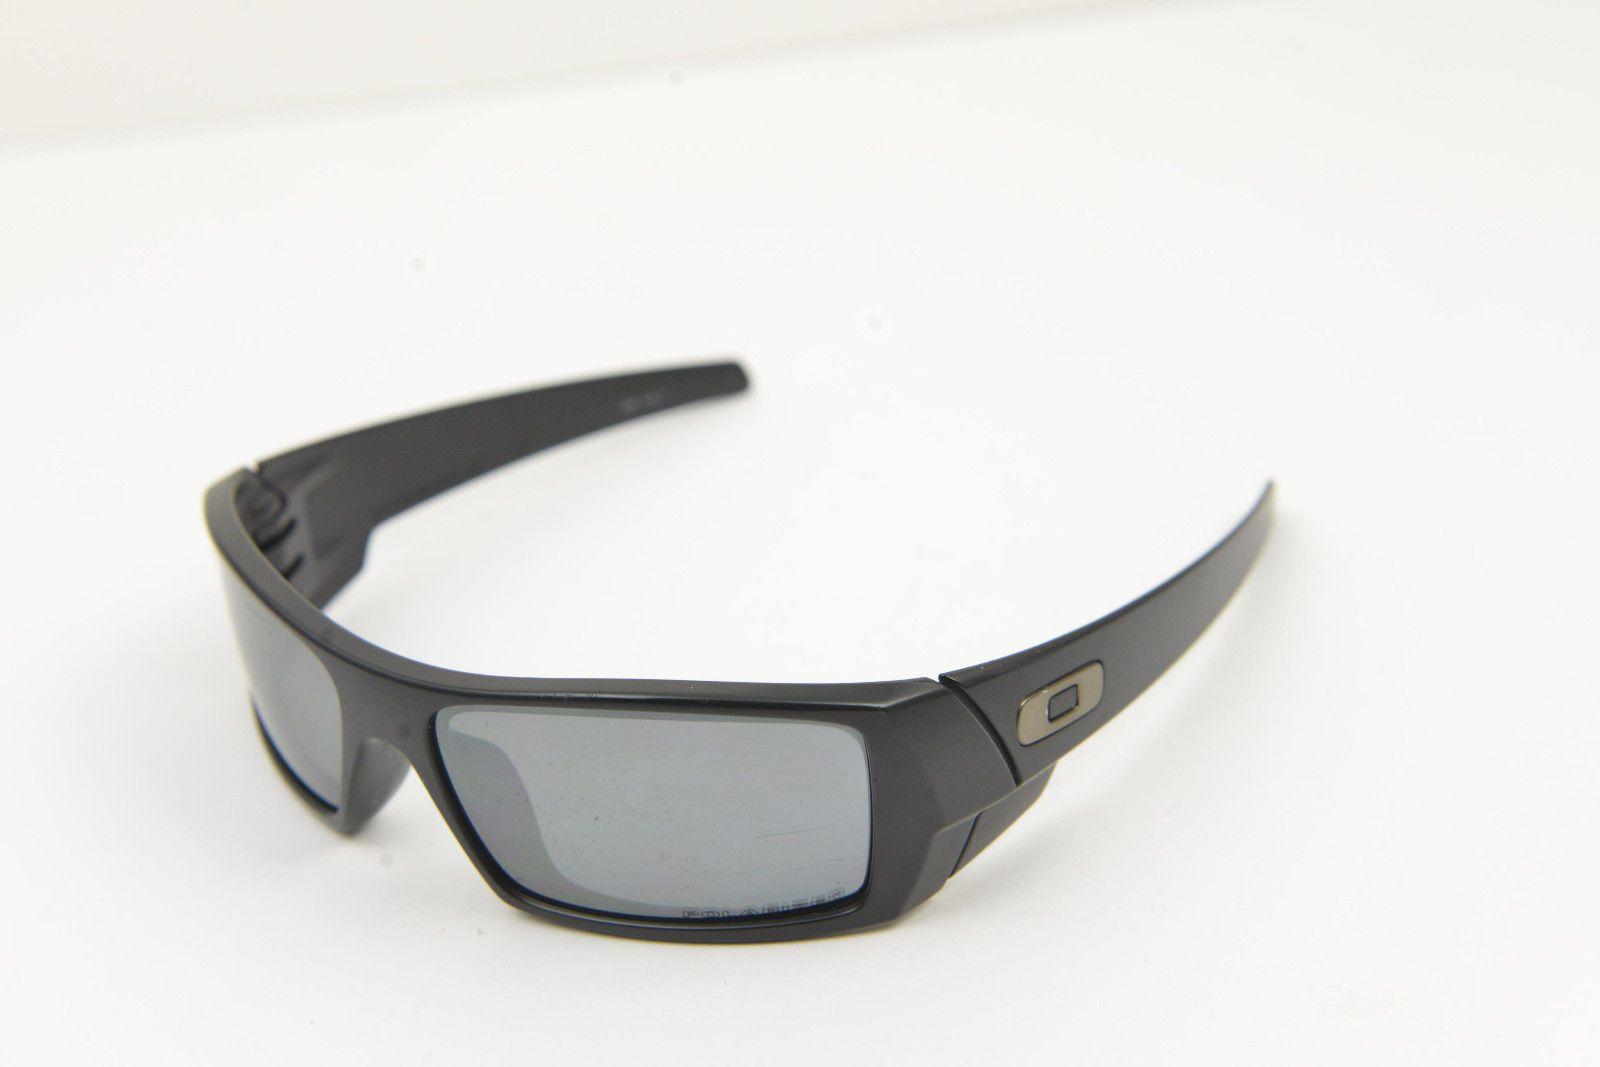 4084d4a5f0 ... oakley gascan 12 856 matte black polarized black iridium mens sunglasses